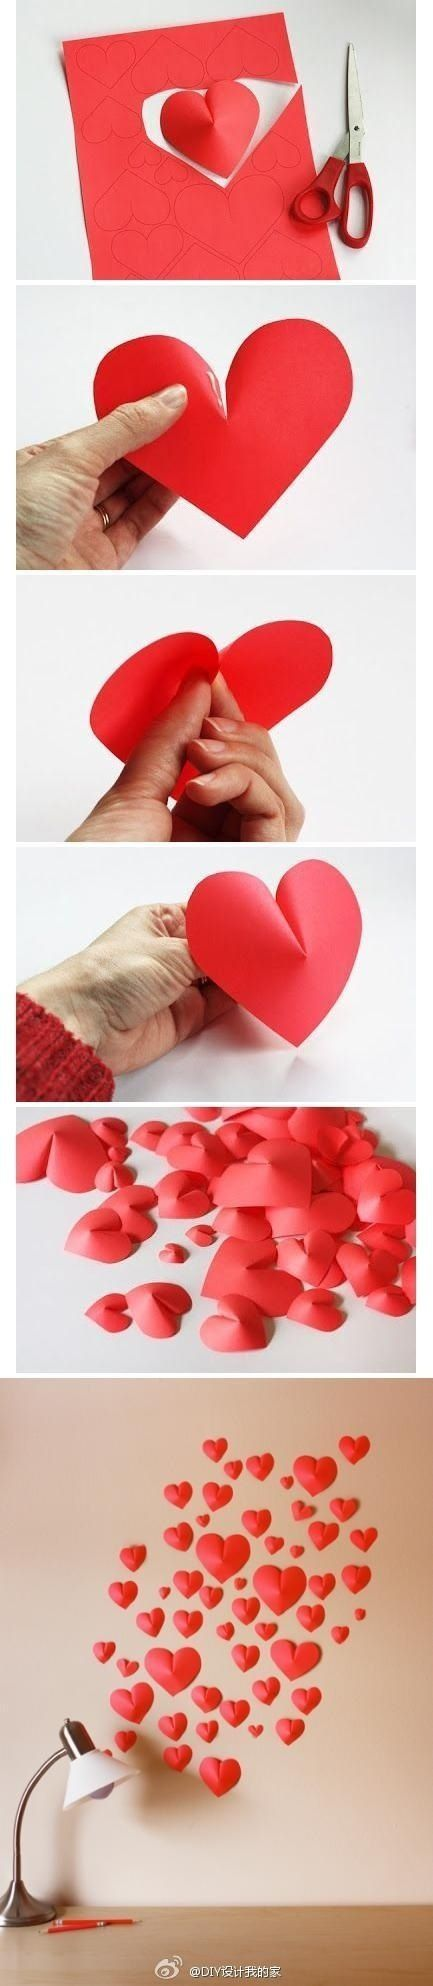 Creative way to make 3D hearts.